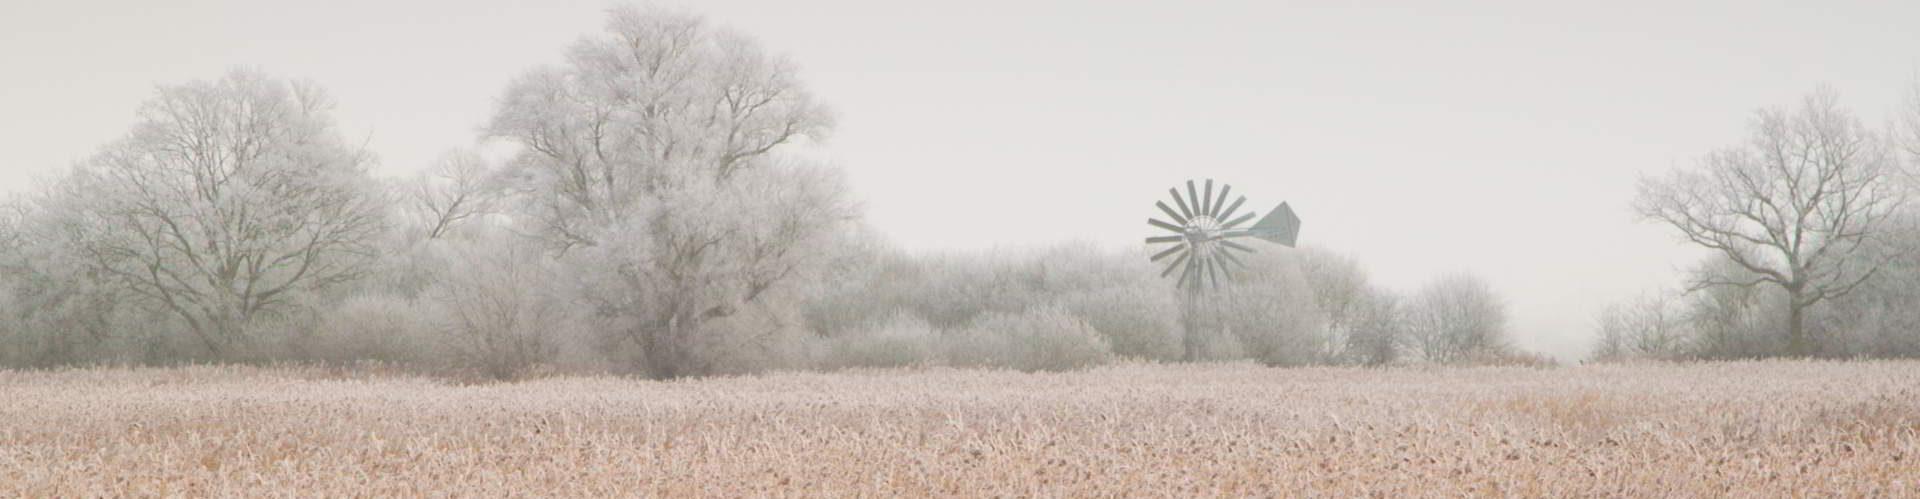 Reedbed-in-freezing-fog